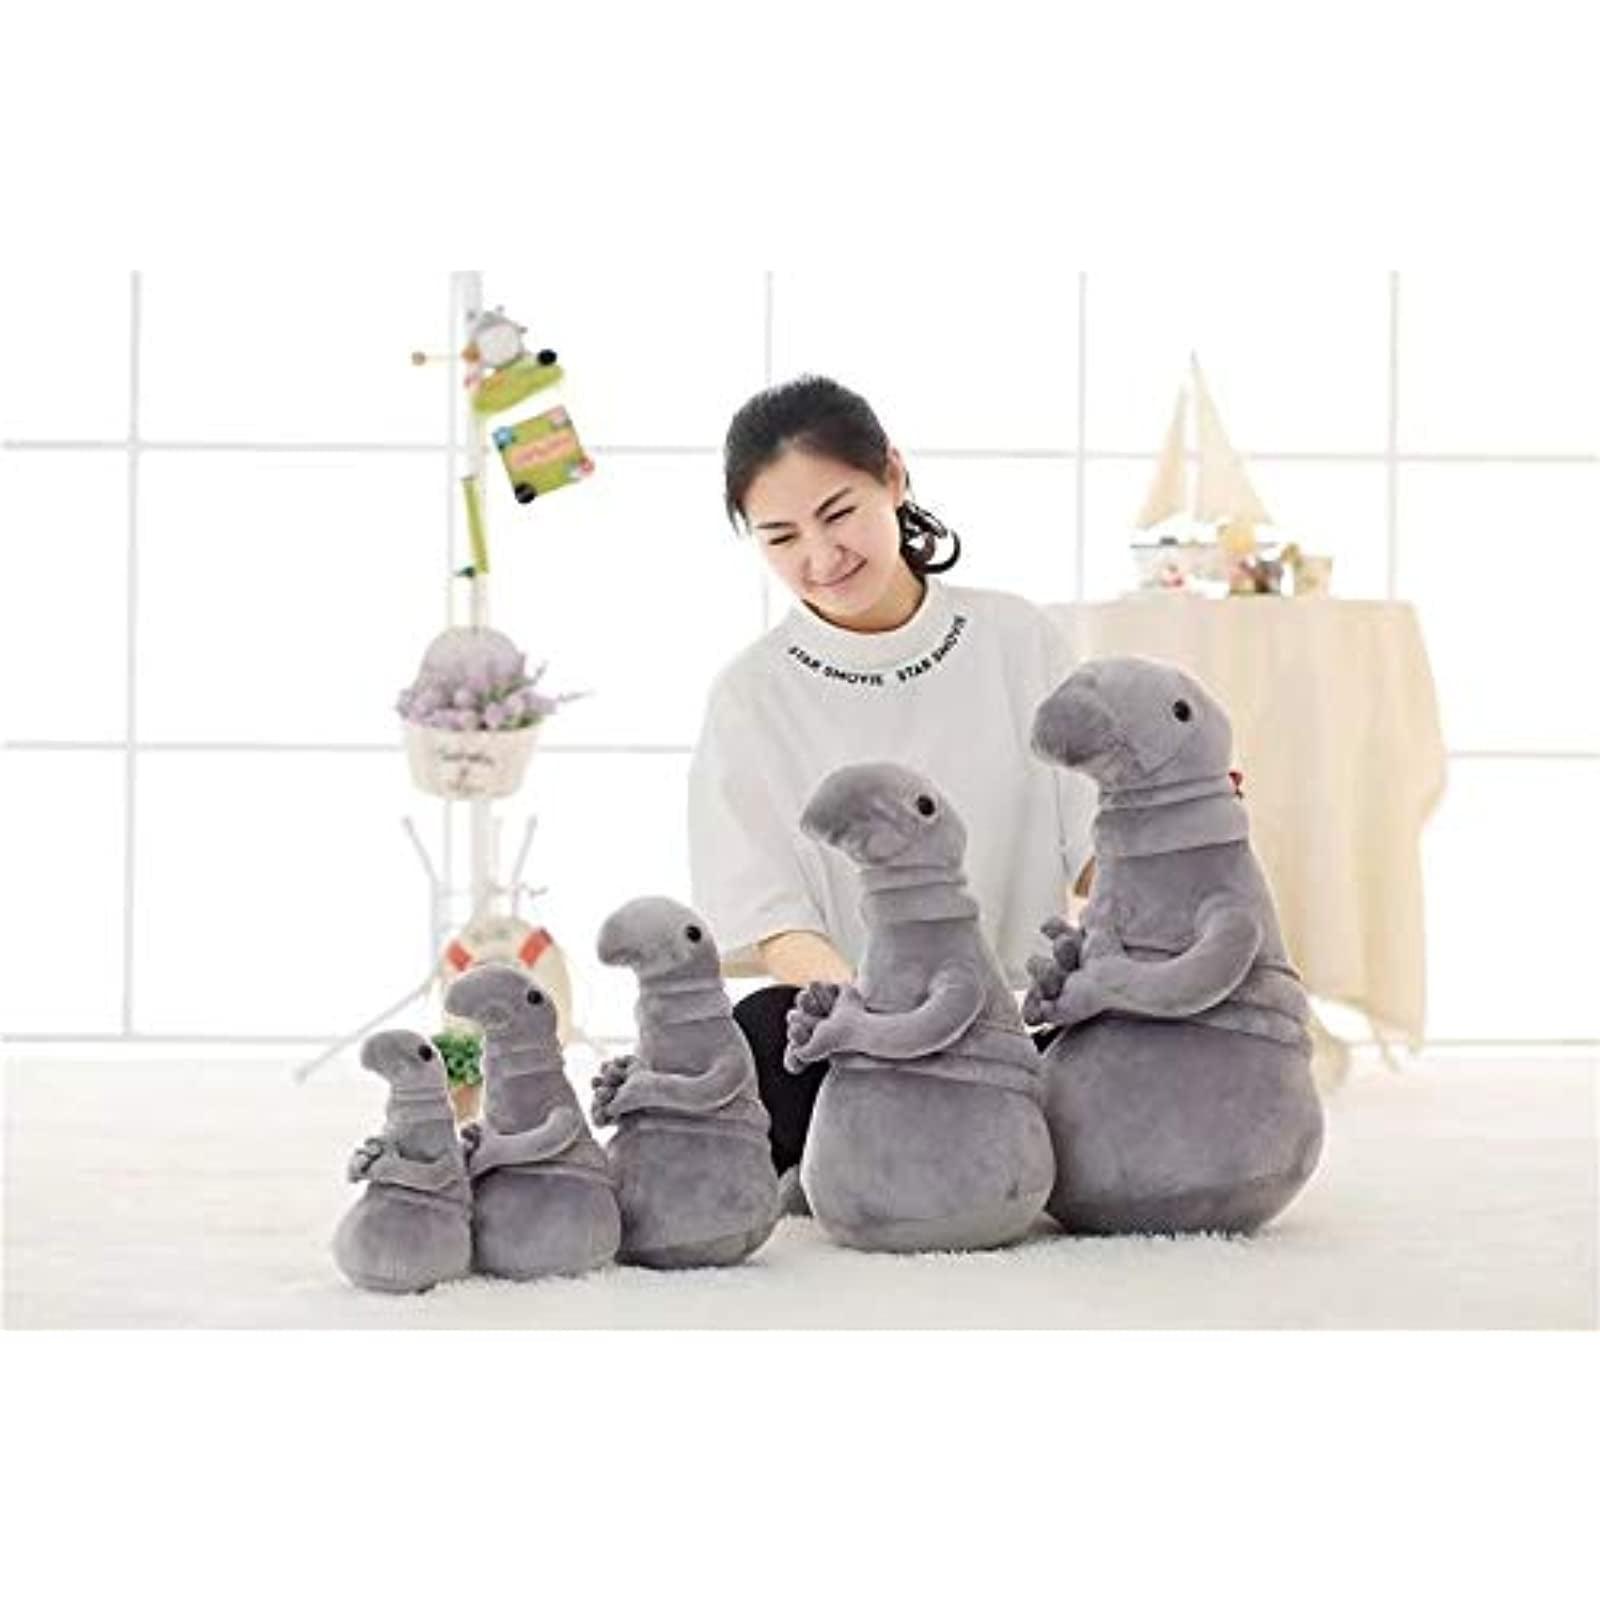 Tubby Gray Blob Zhdun Stuffed Doll Gray Tubby Plush Doll Toys 30cm Gift For Kid